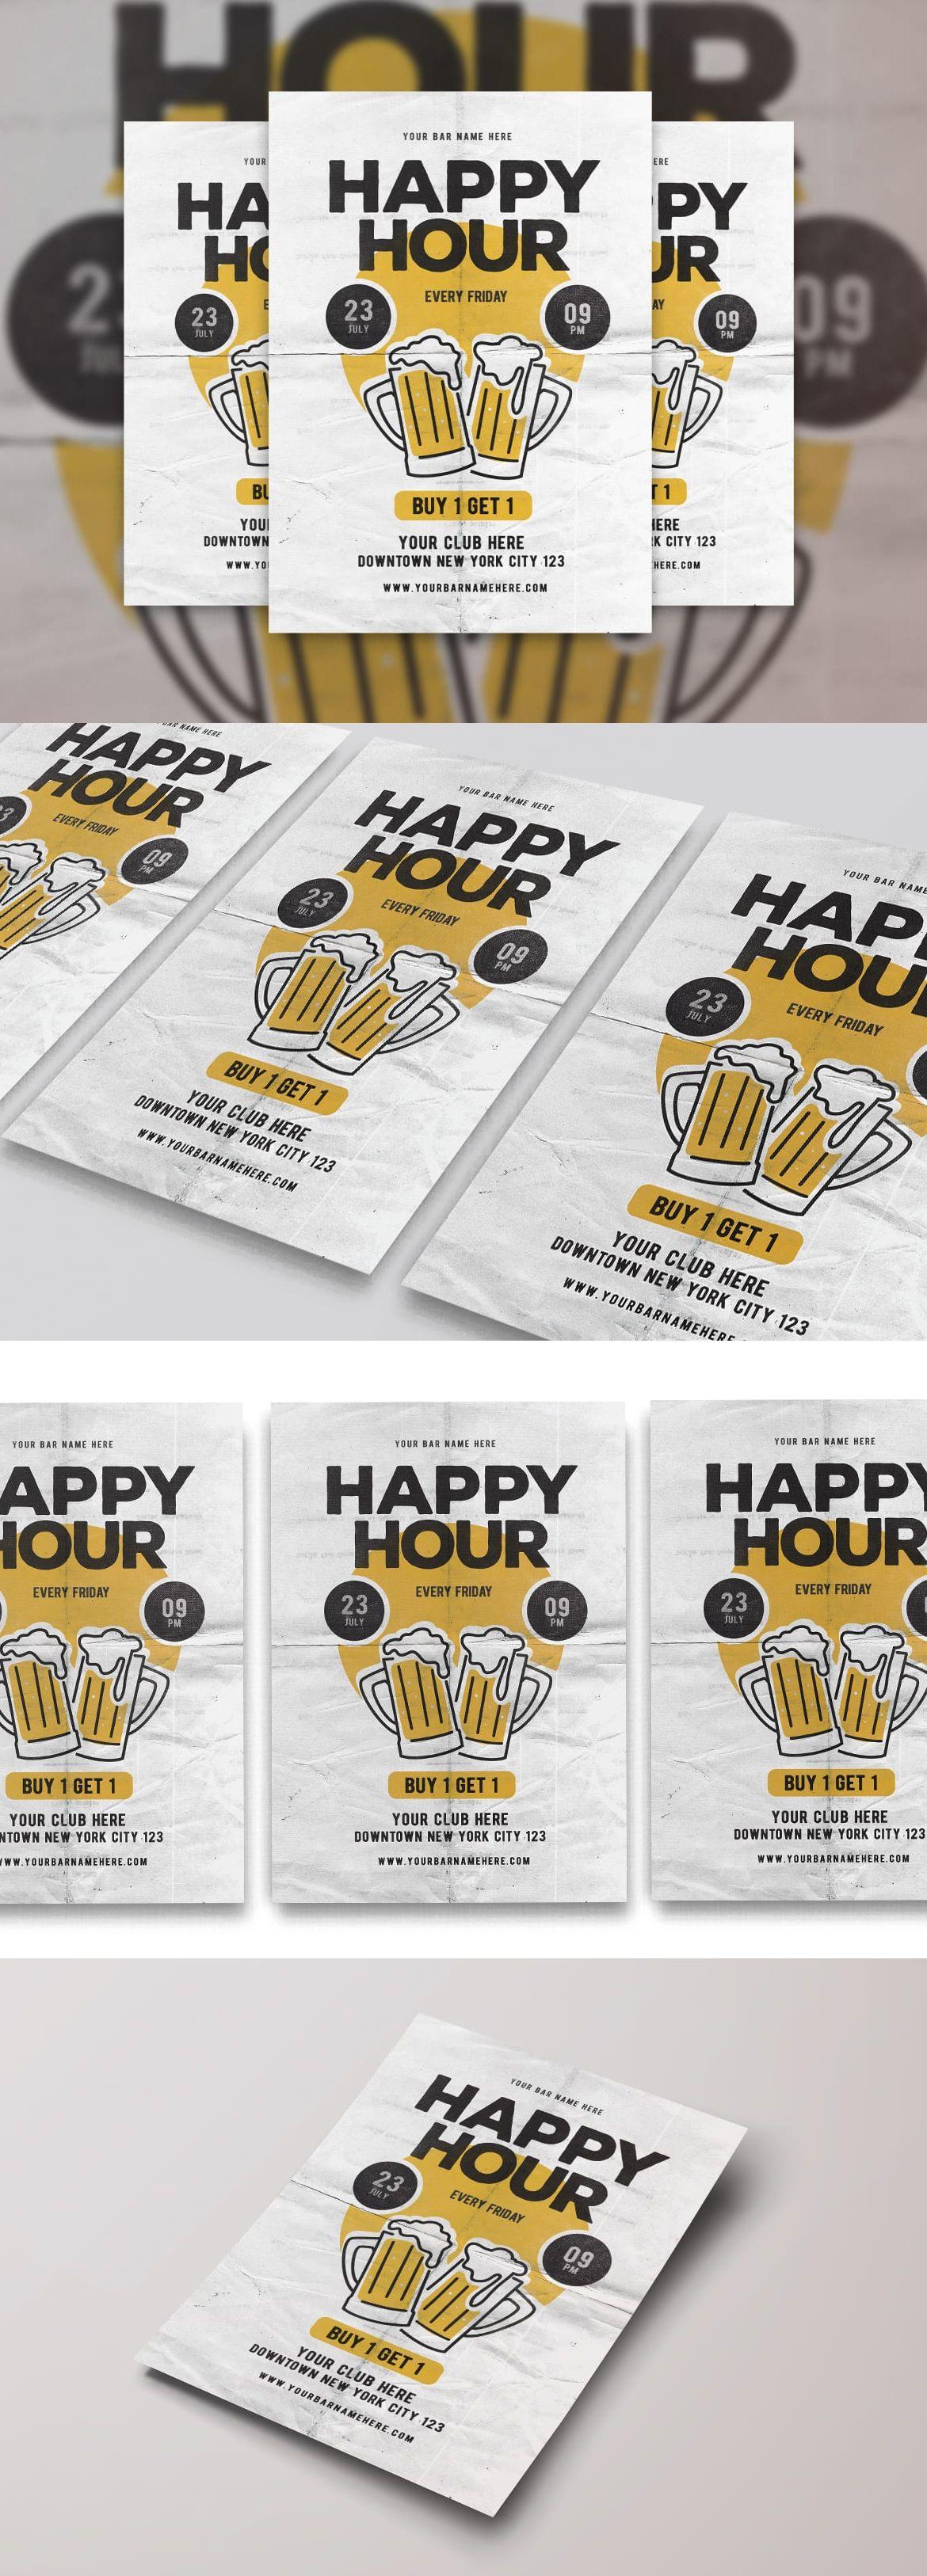 Happy hour flyer design template psd flyer design pinterest happy hour flyer design template psd maxwellsz